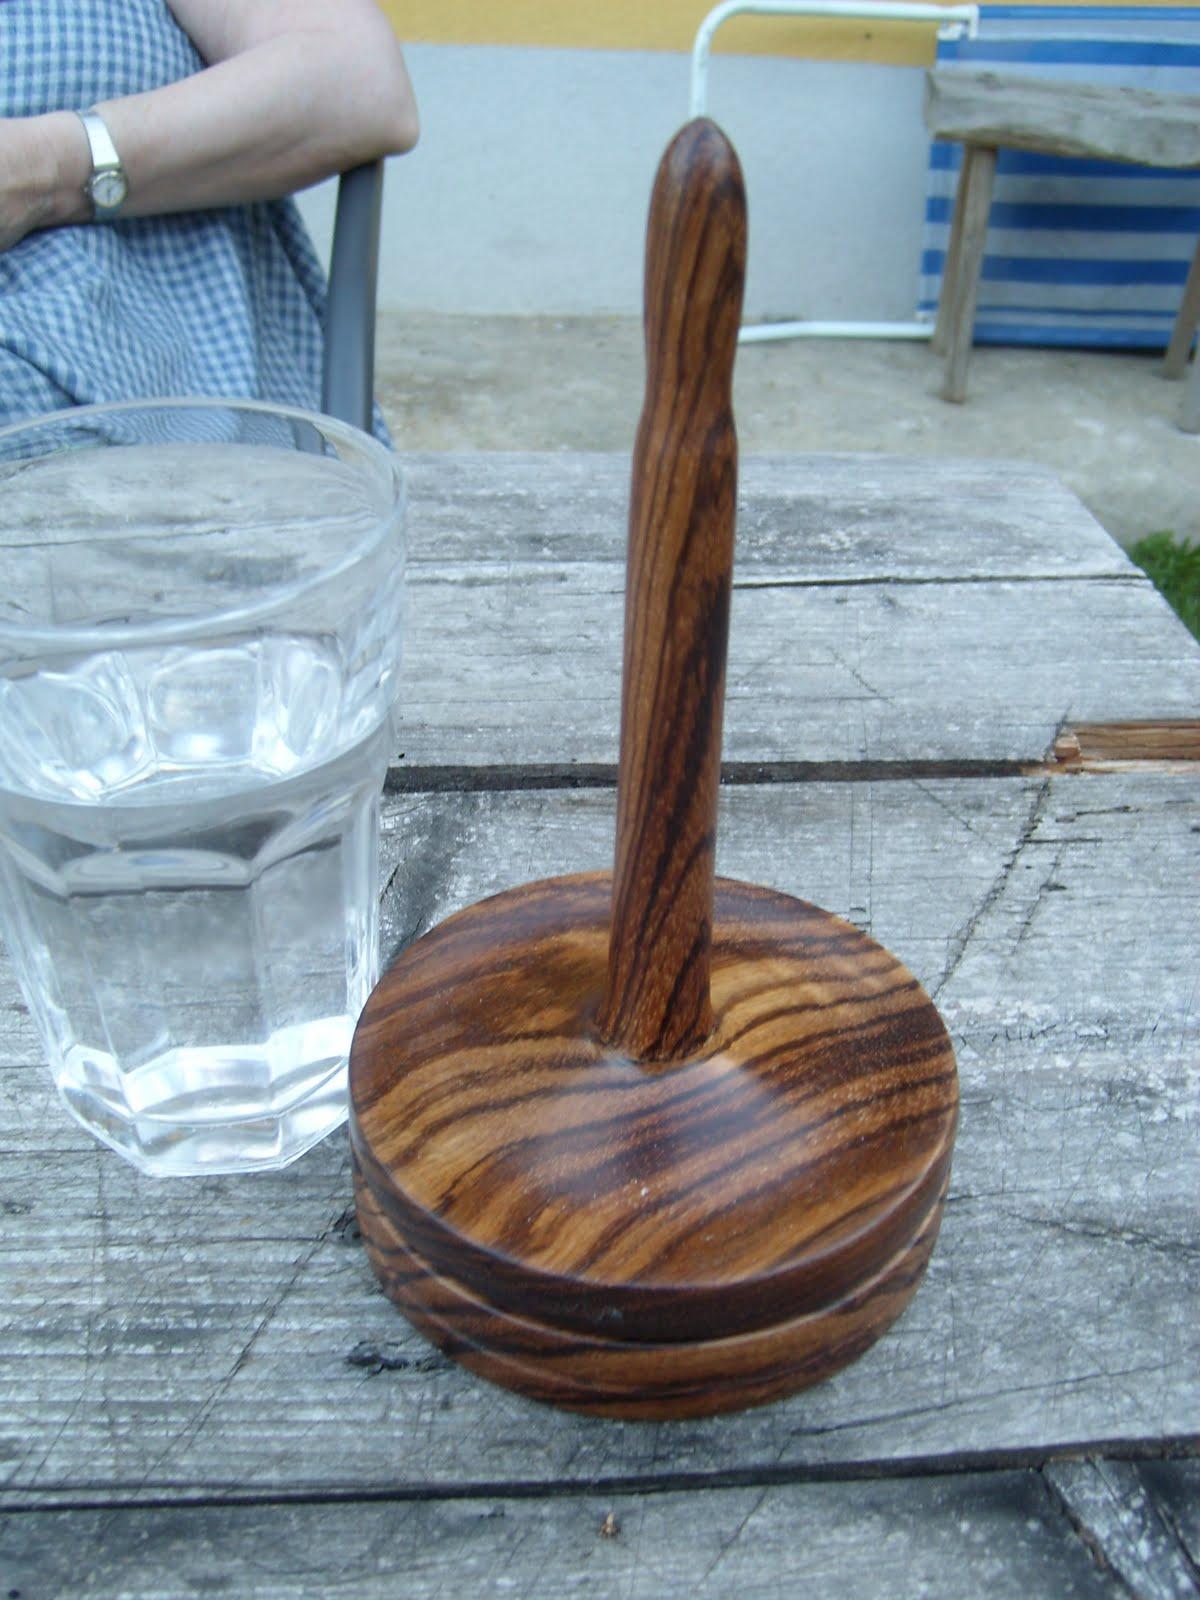 Wooden Knitting Wool Holder : Bockfilz noro slipover and a turning yarn holder